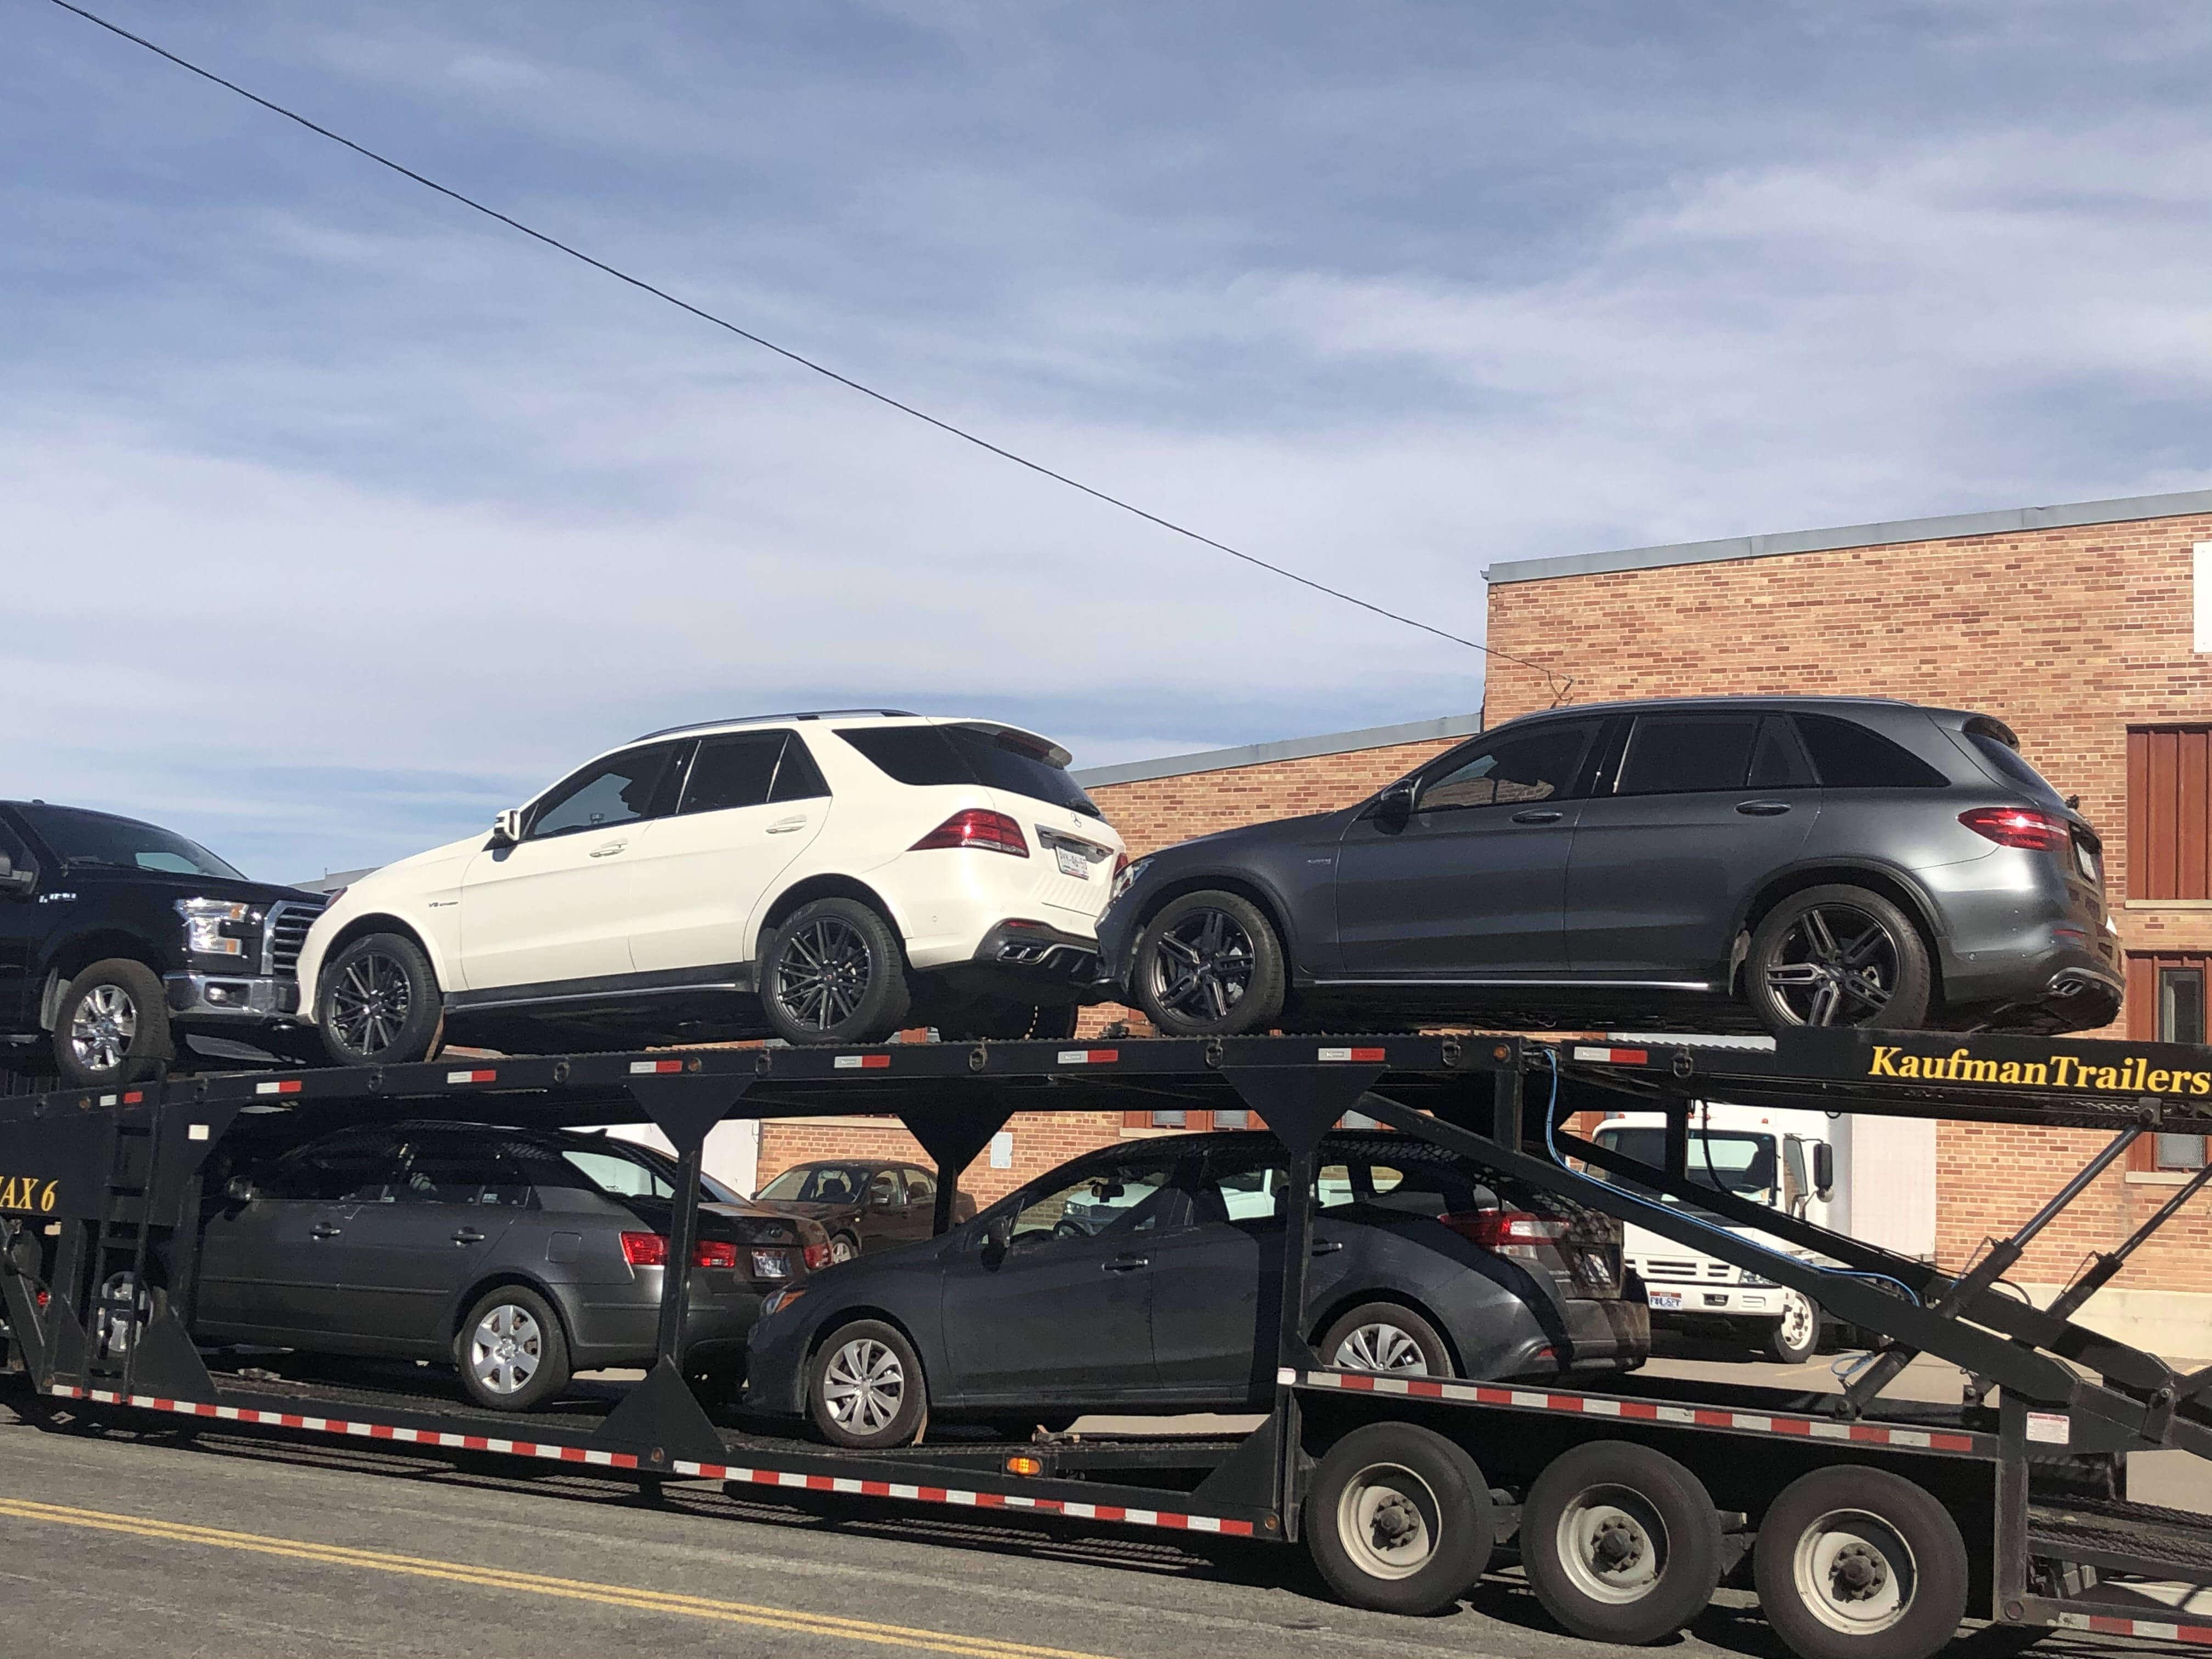 Transporting Bulletproof Mercedes Benz GLC 43 Armormax Sedan Exterior